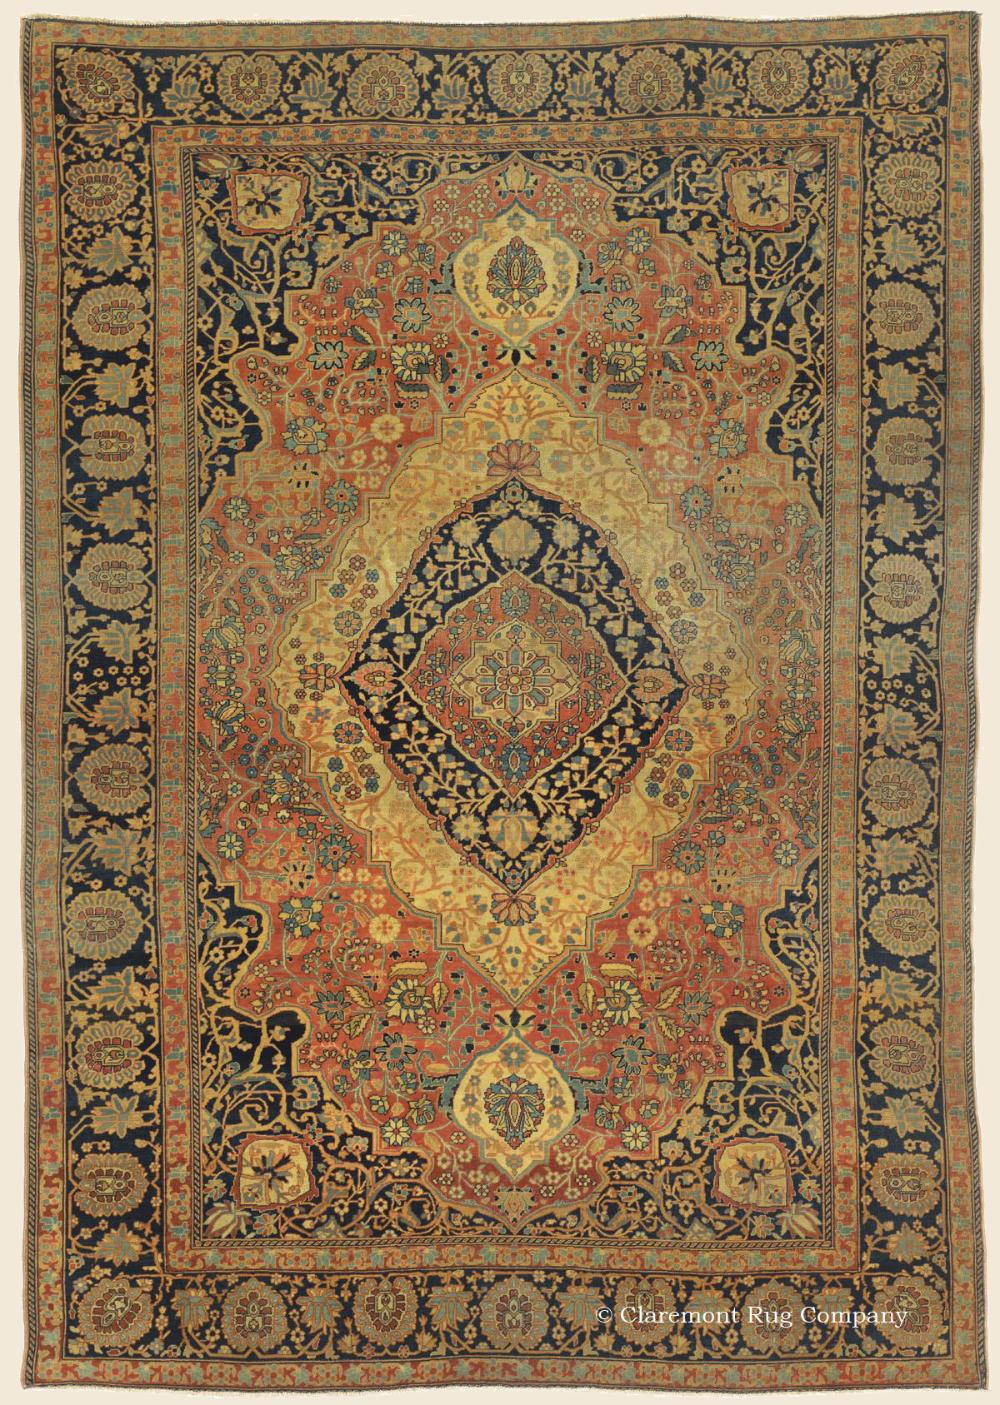 World Class Motasham Kashan Antique Persian Carpet Antique Rug 4 8 X 6 9 Circa 1850 In 2020 Antique Rugs Persian Carpet Claremont Rug Company Persian Carpet